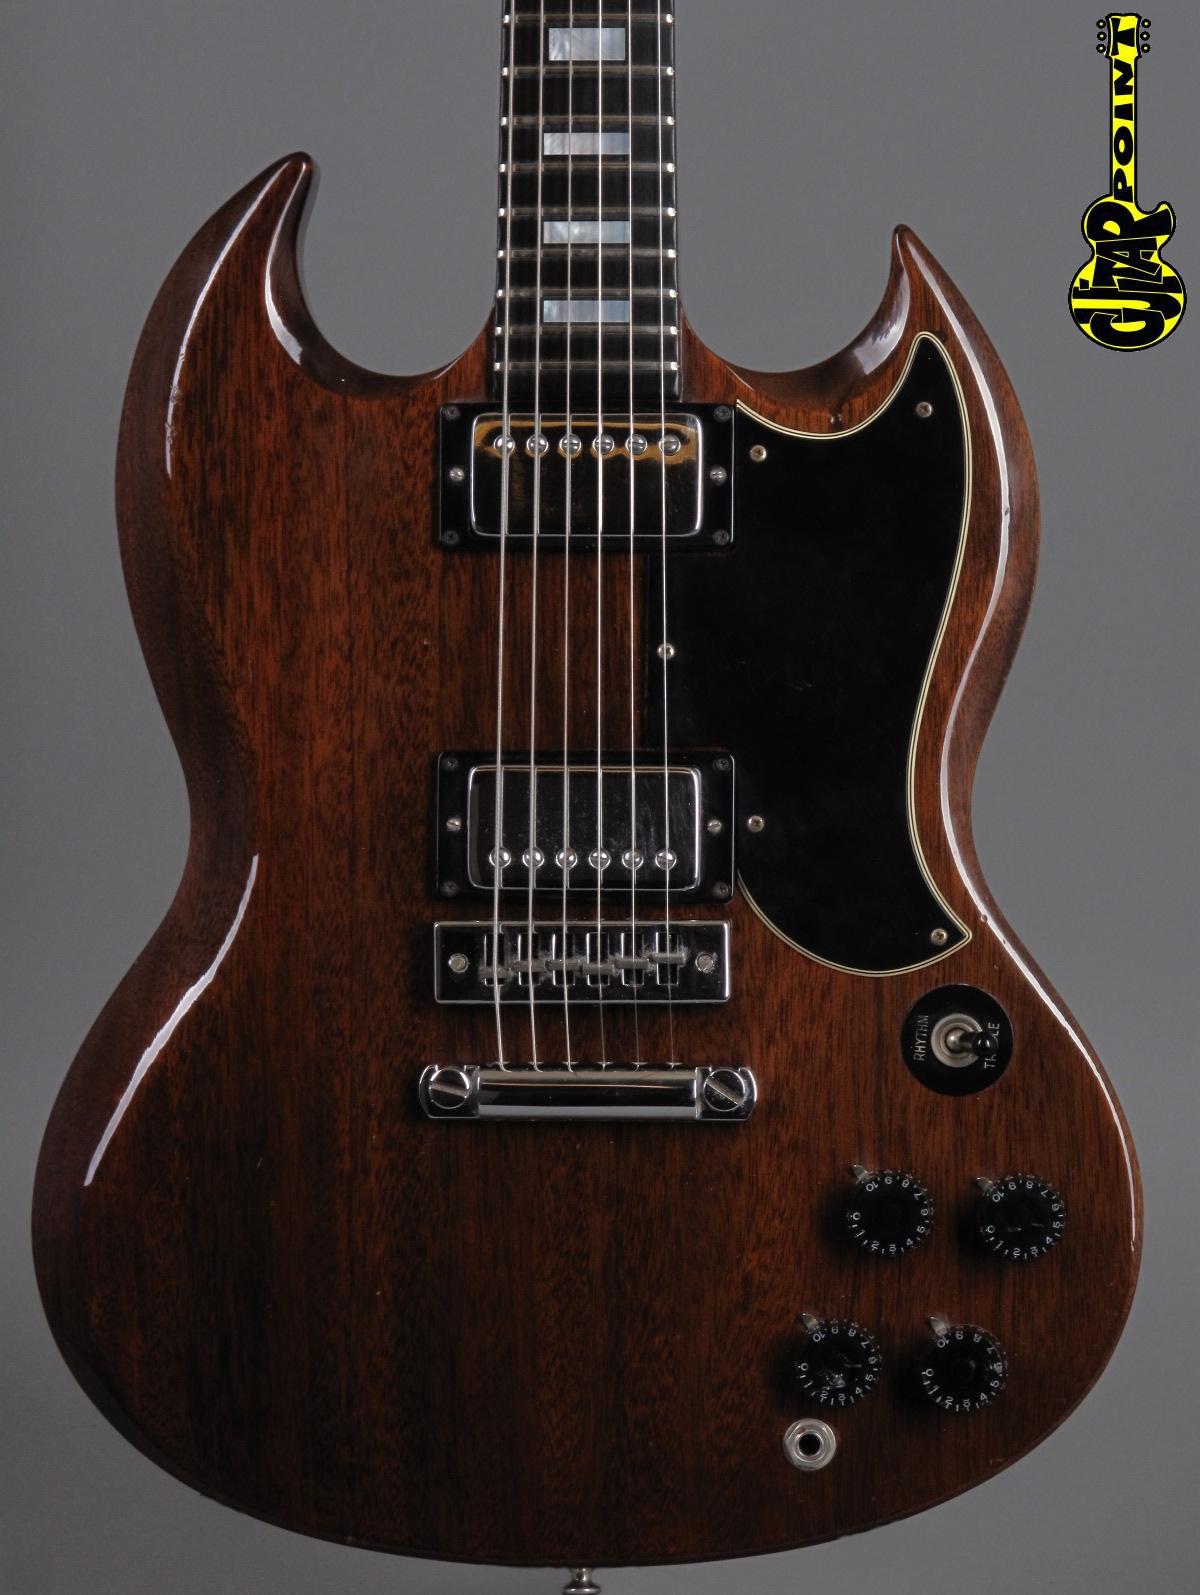 1974 Gibson SG Standard - Mahogany